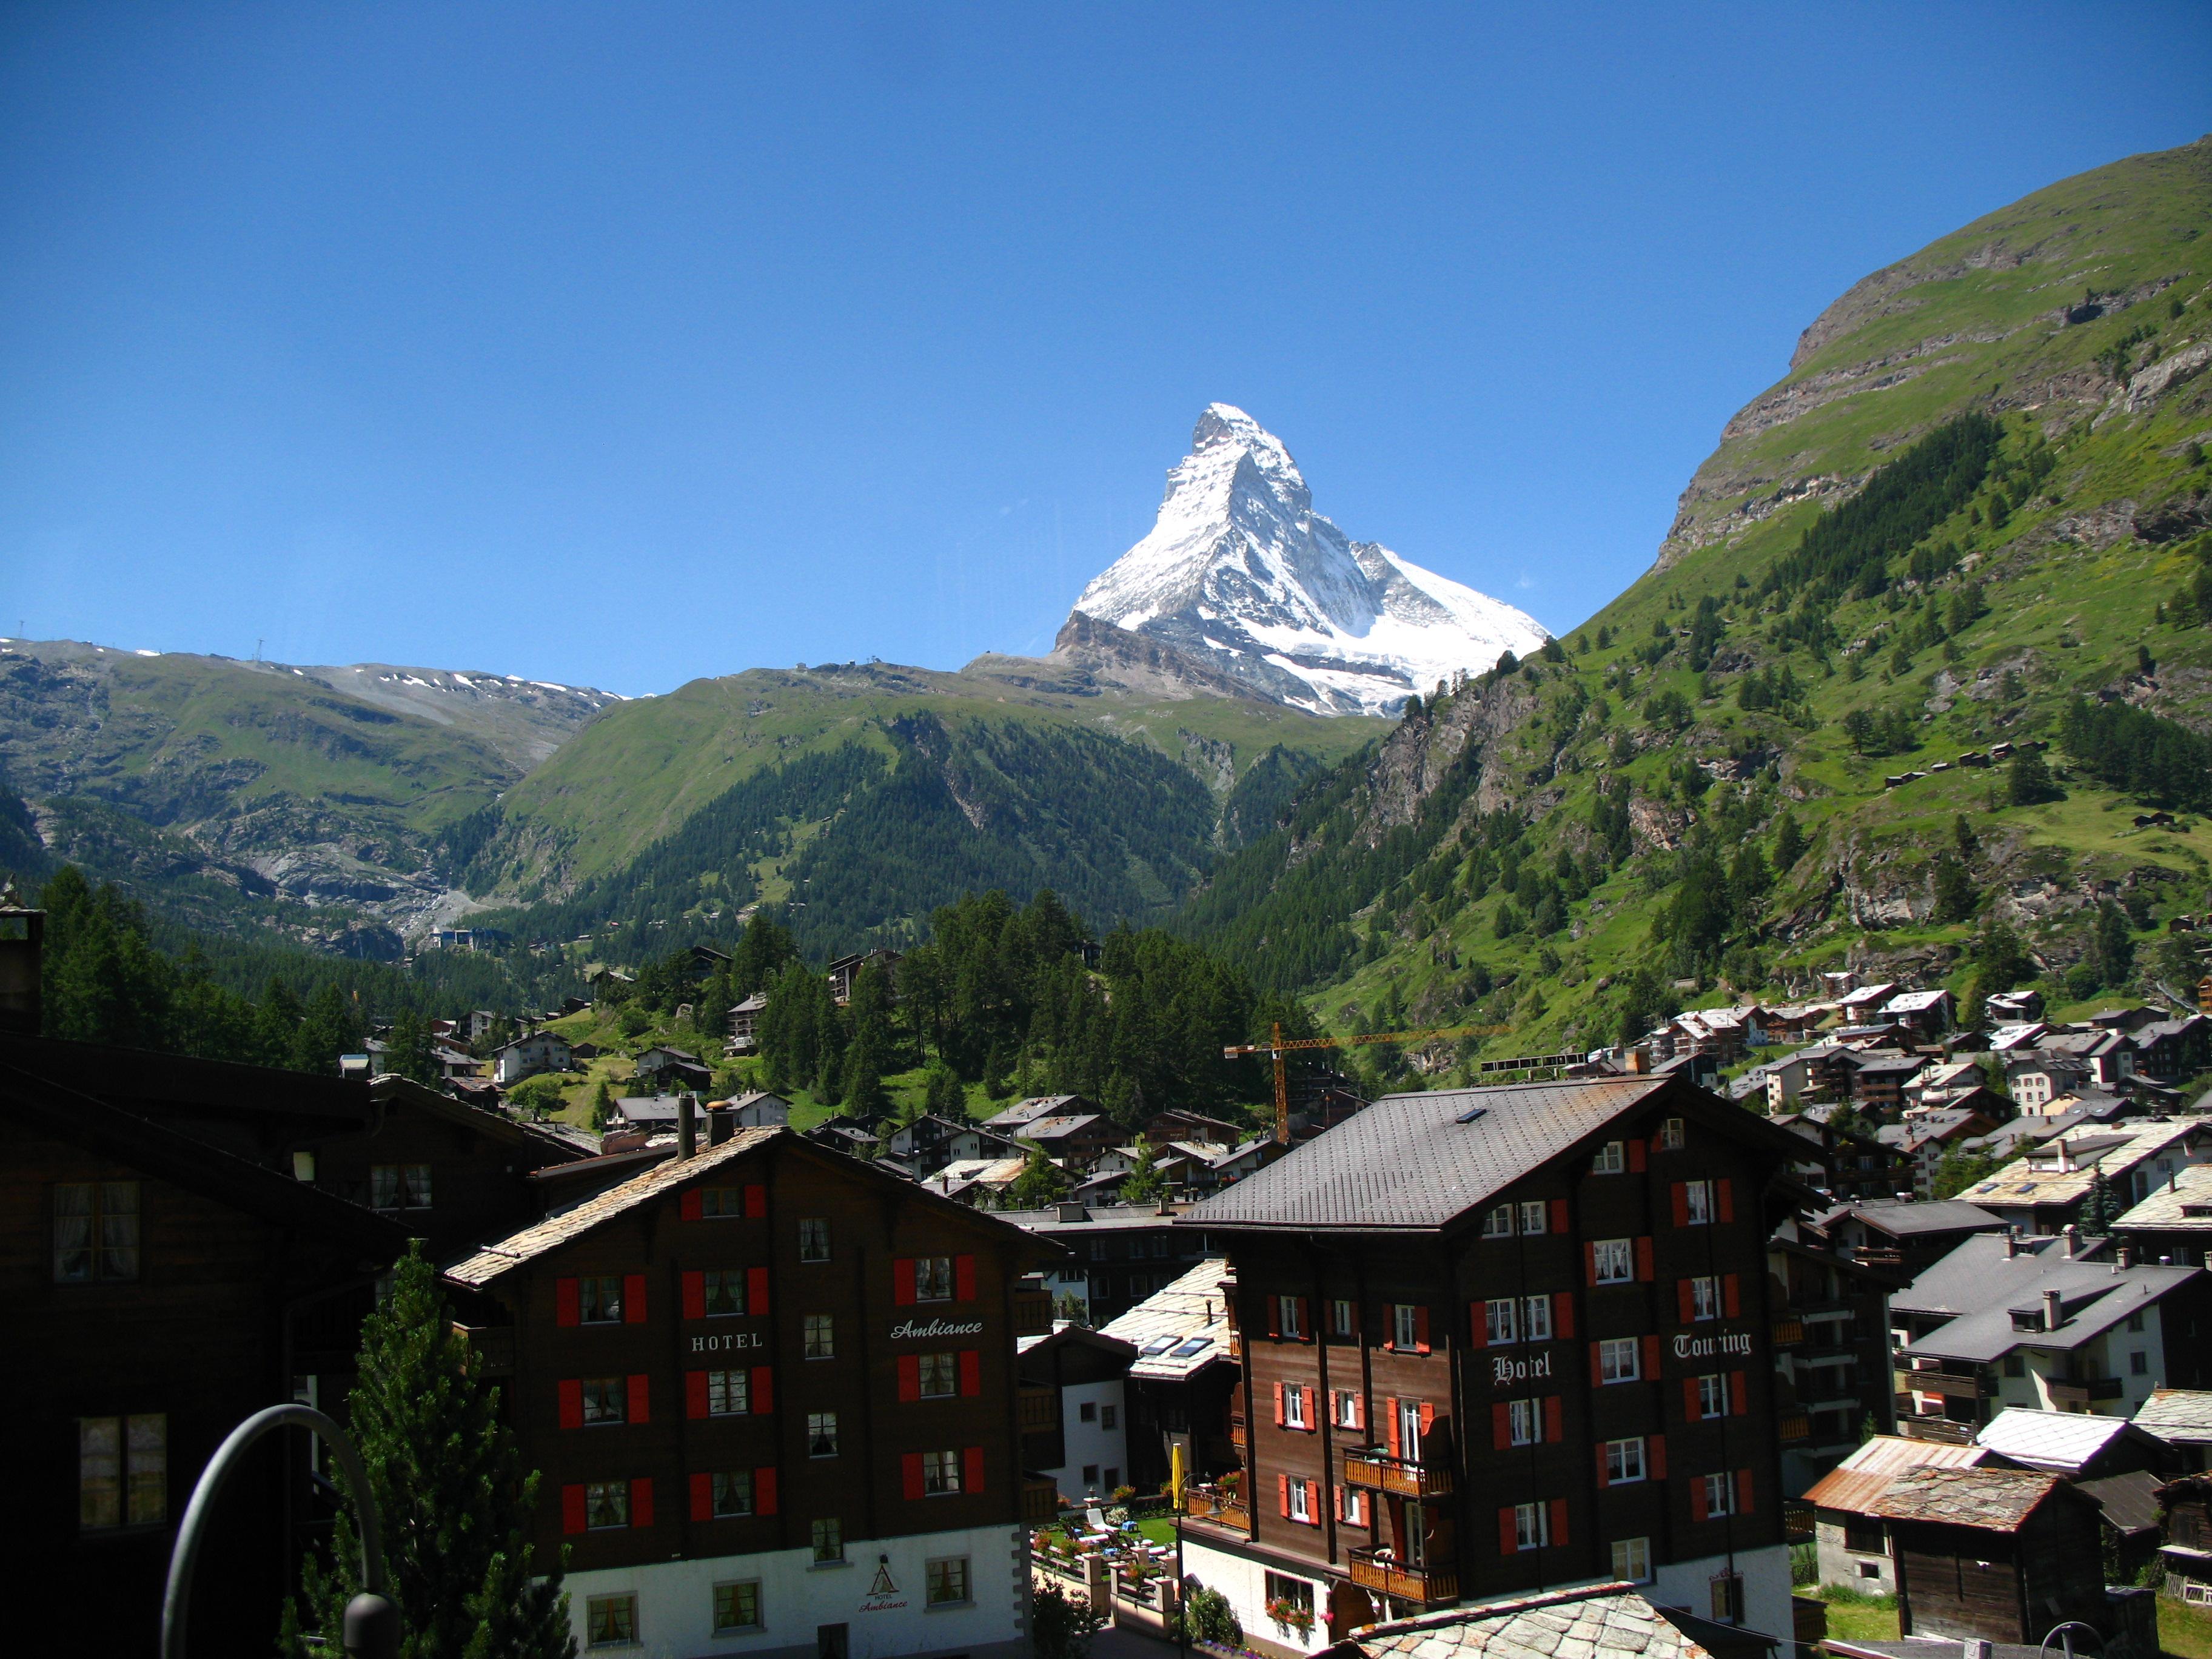 English: Location: Zermatt, Switzerland.